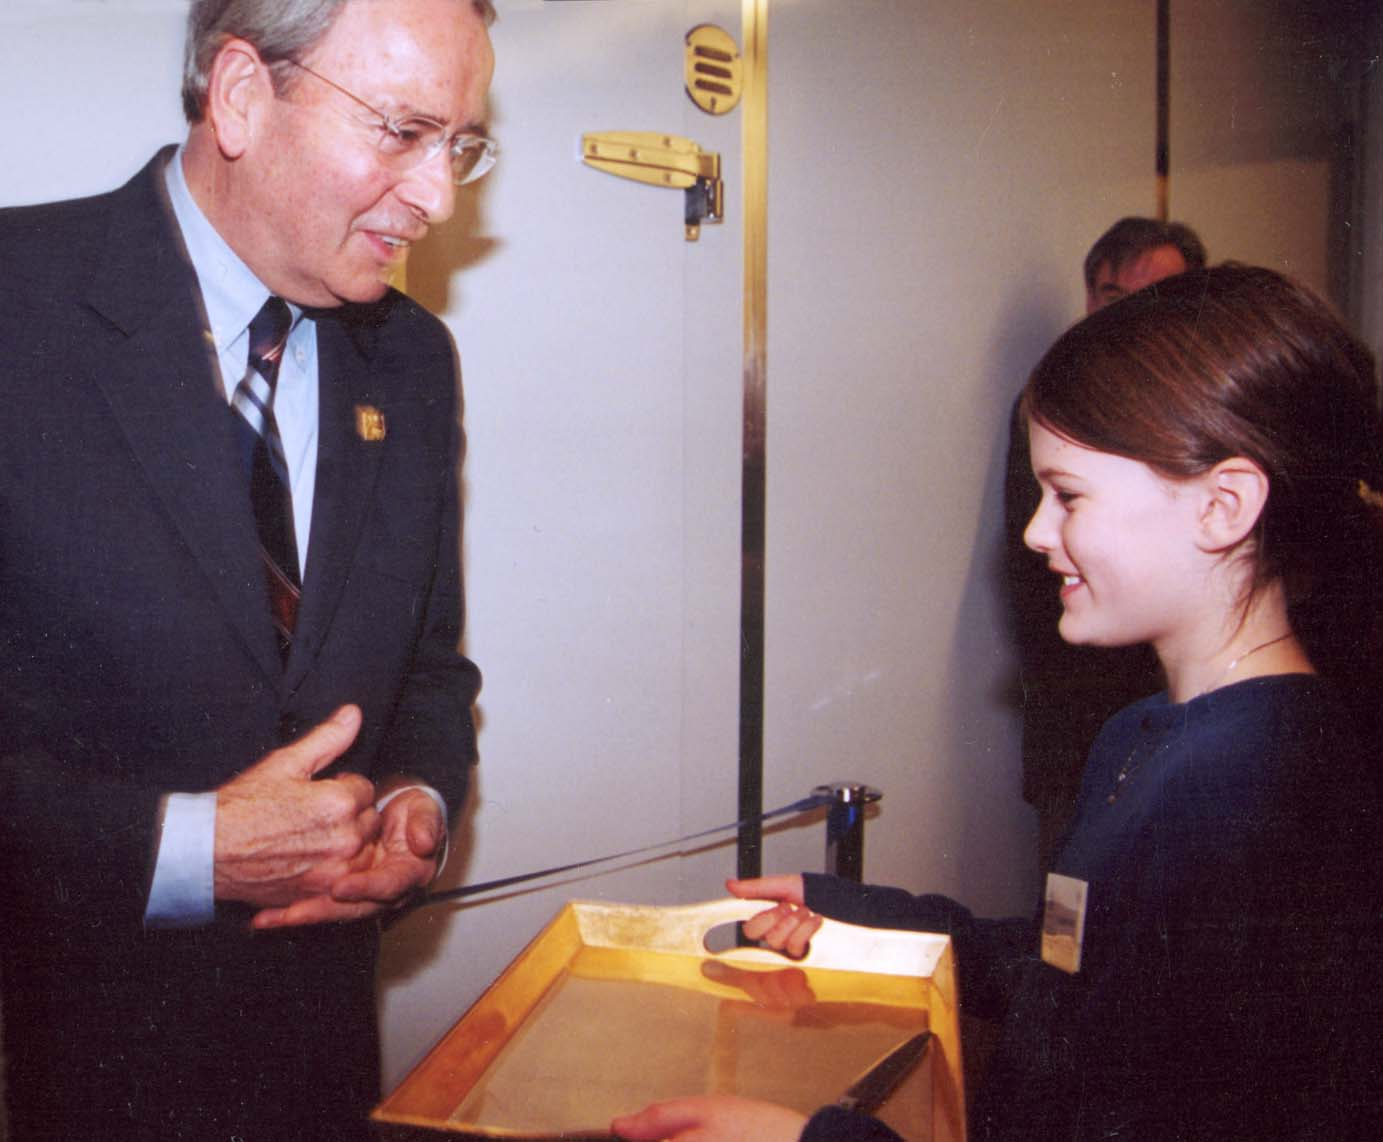 Mayor Owen being offered scissors